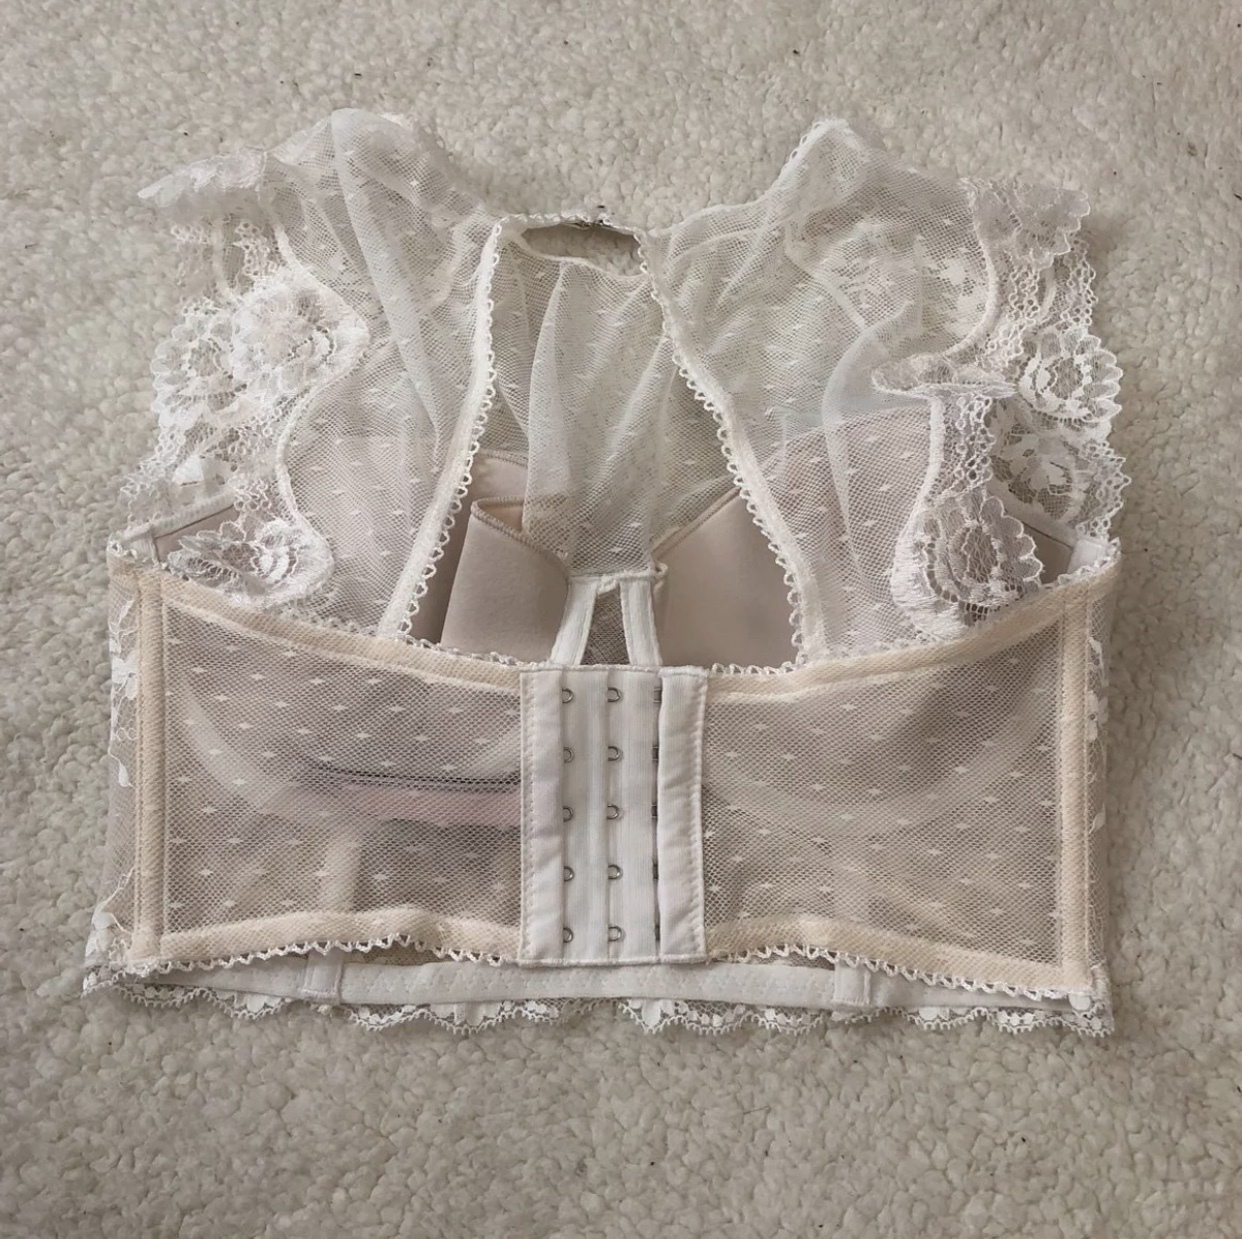 79c161857b1e5 Victoria Secret Dream Angel Lace Bralette and 50 similar items